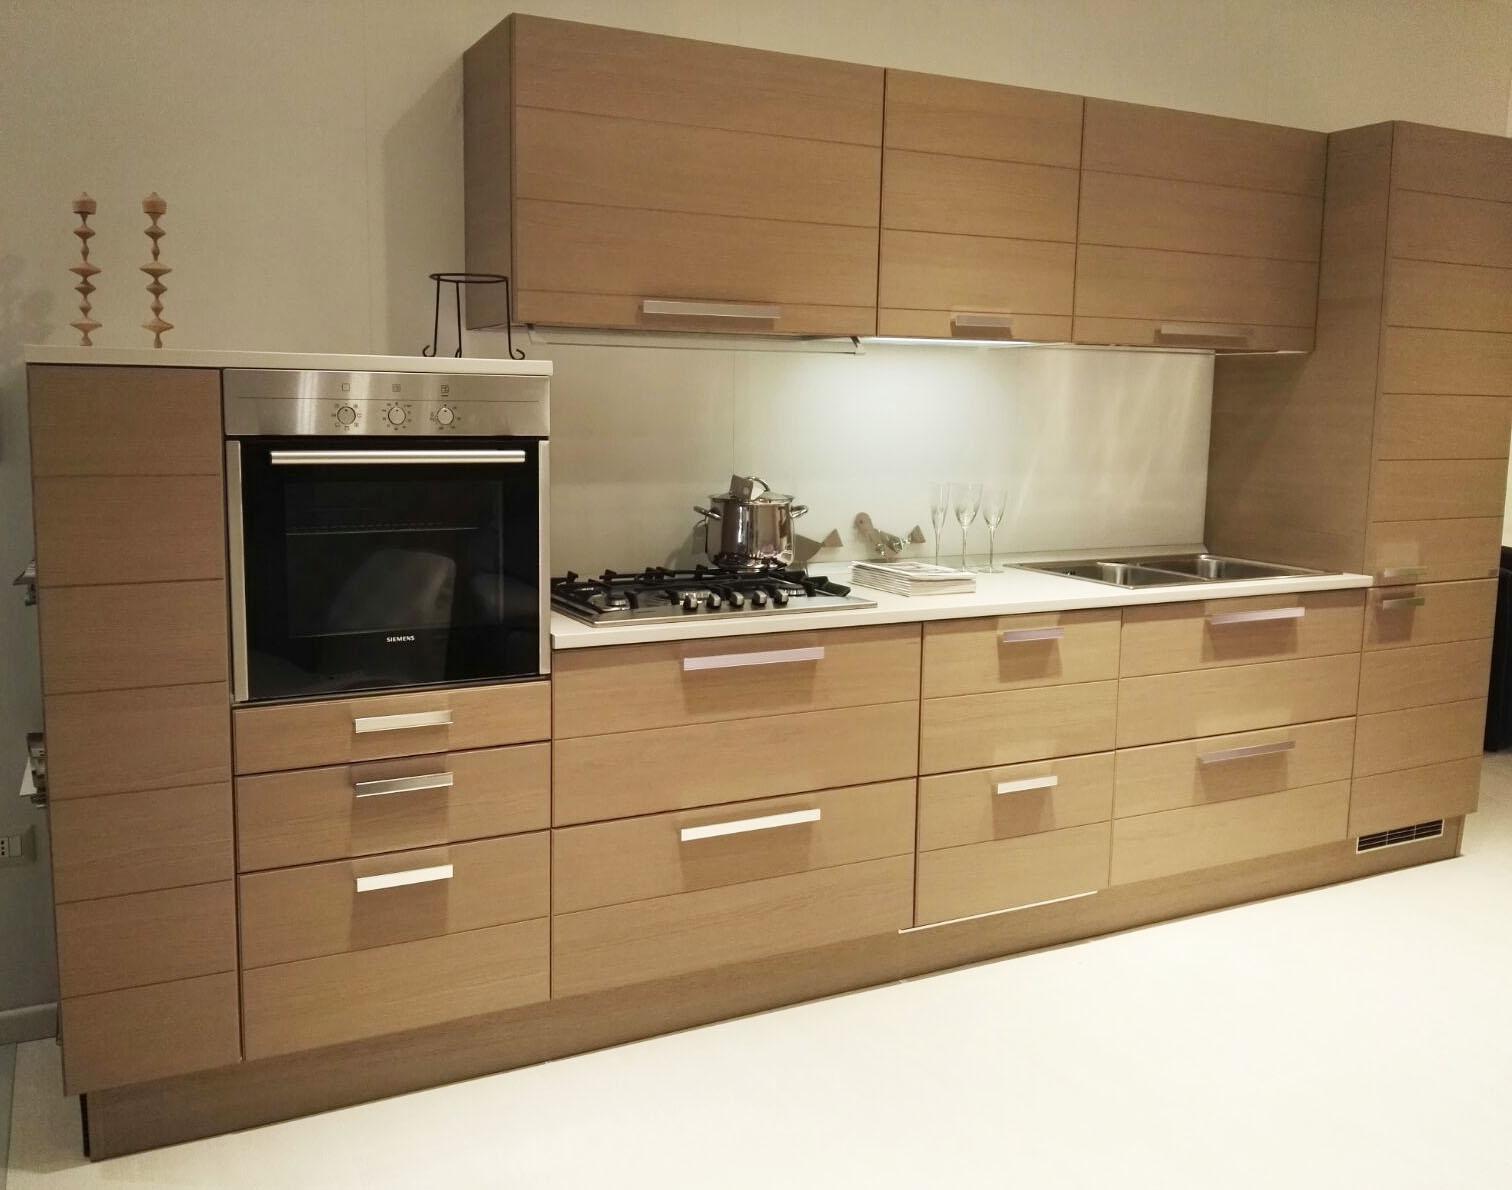 Cucina Scavolini Open Moderna Legno - Cucine a prezzi scontati